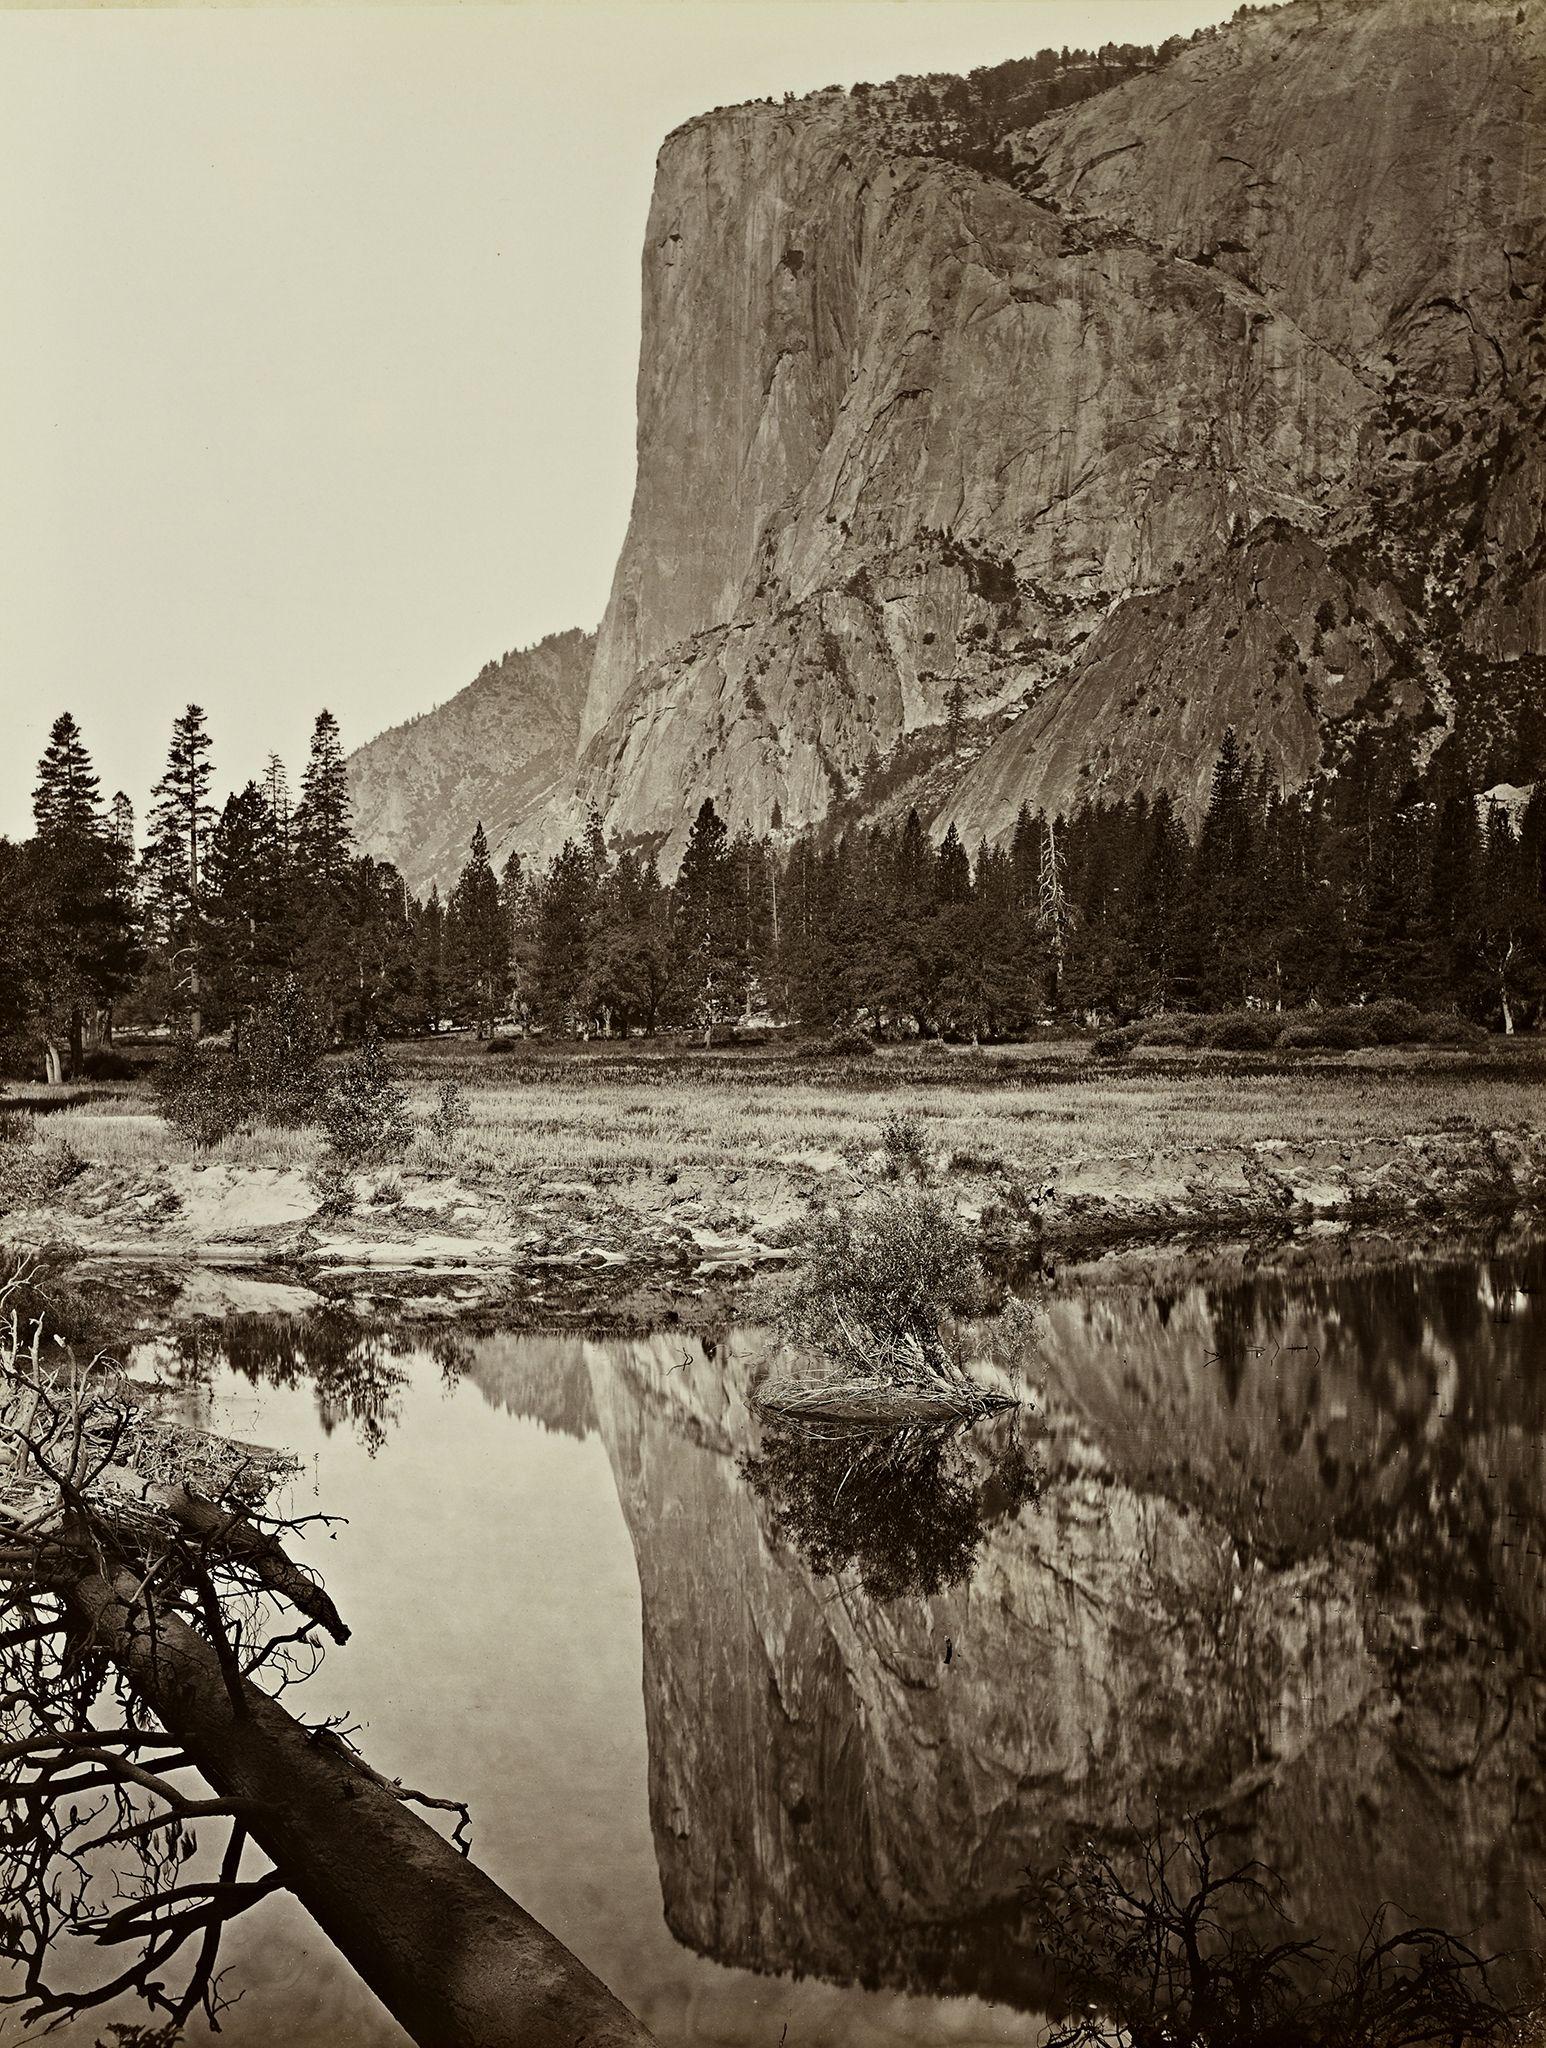 Carleton Watkins S Mammoth Vision Of Yosemite Landscape Photography Nature Vintage Nature Photography Nature Photography